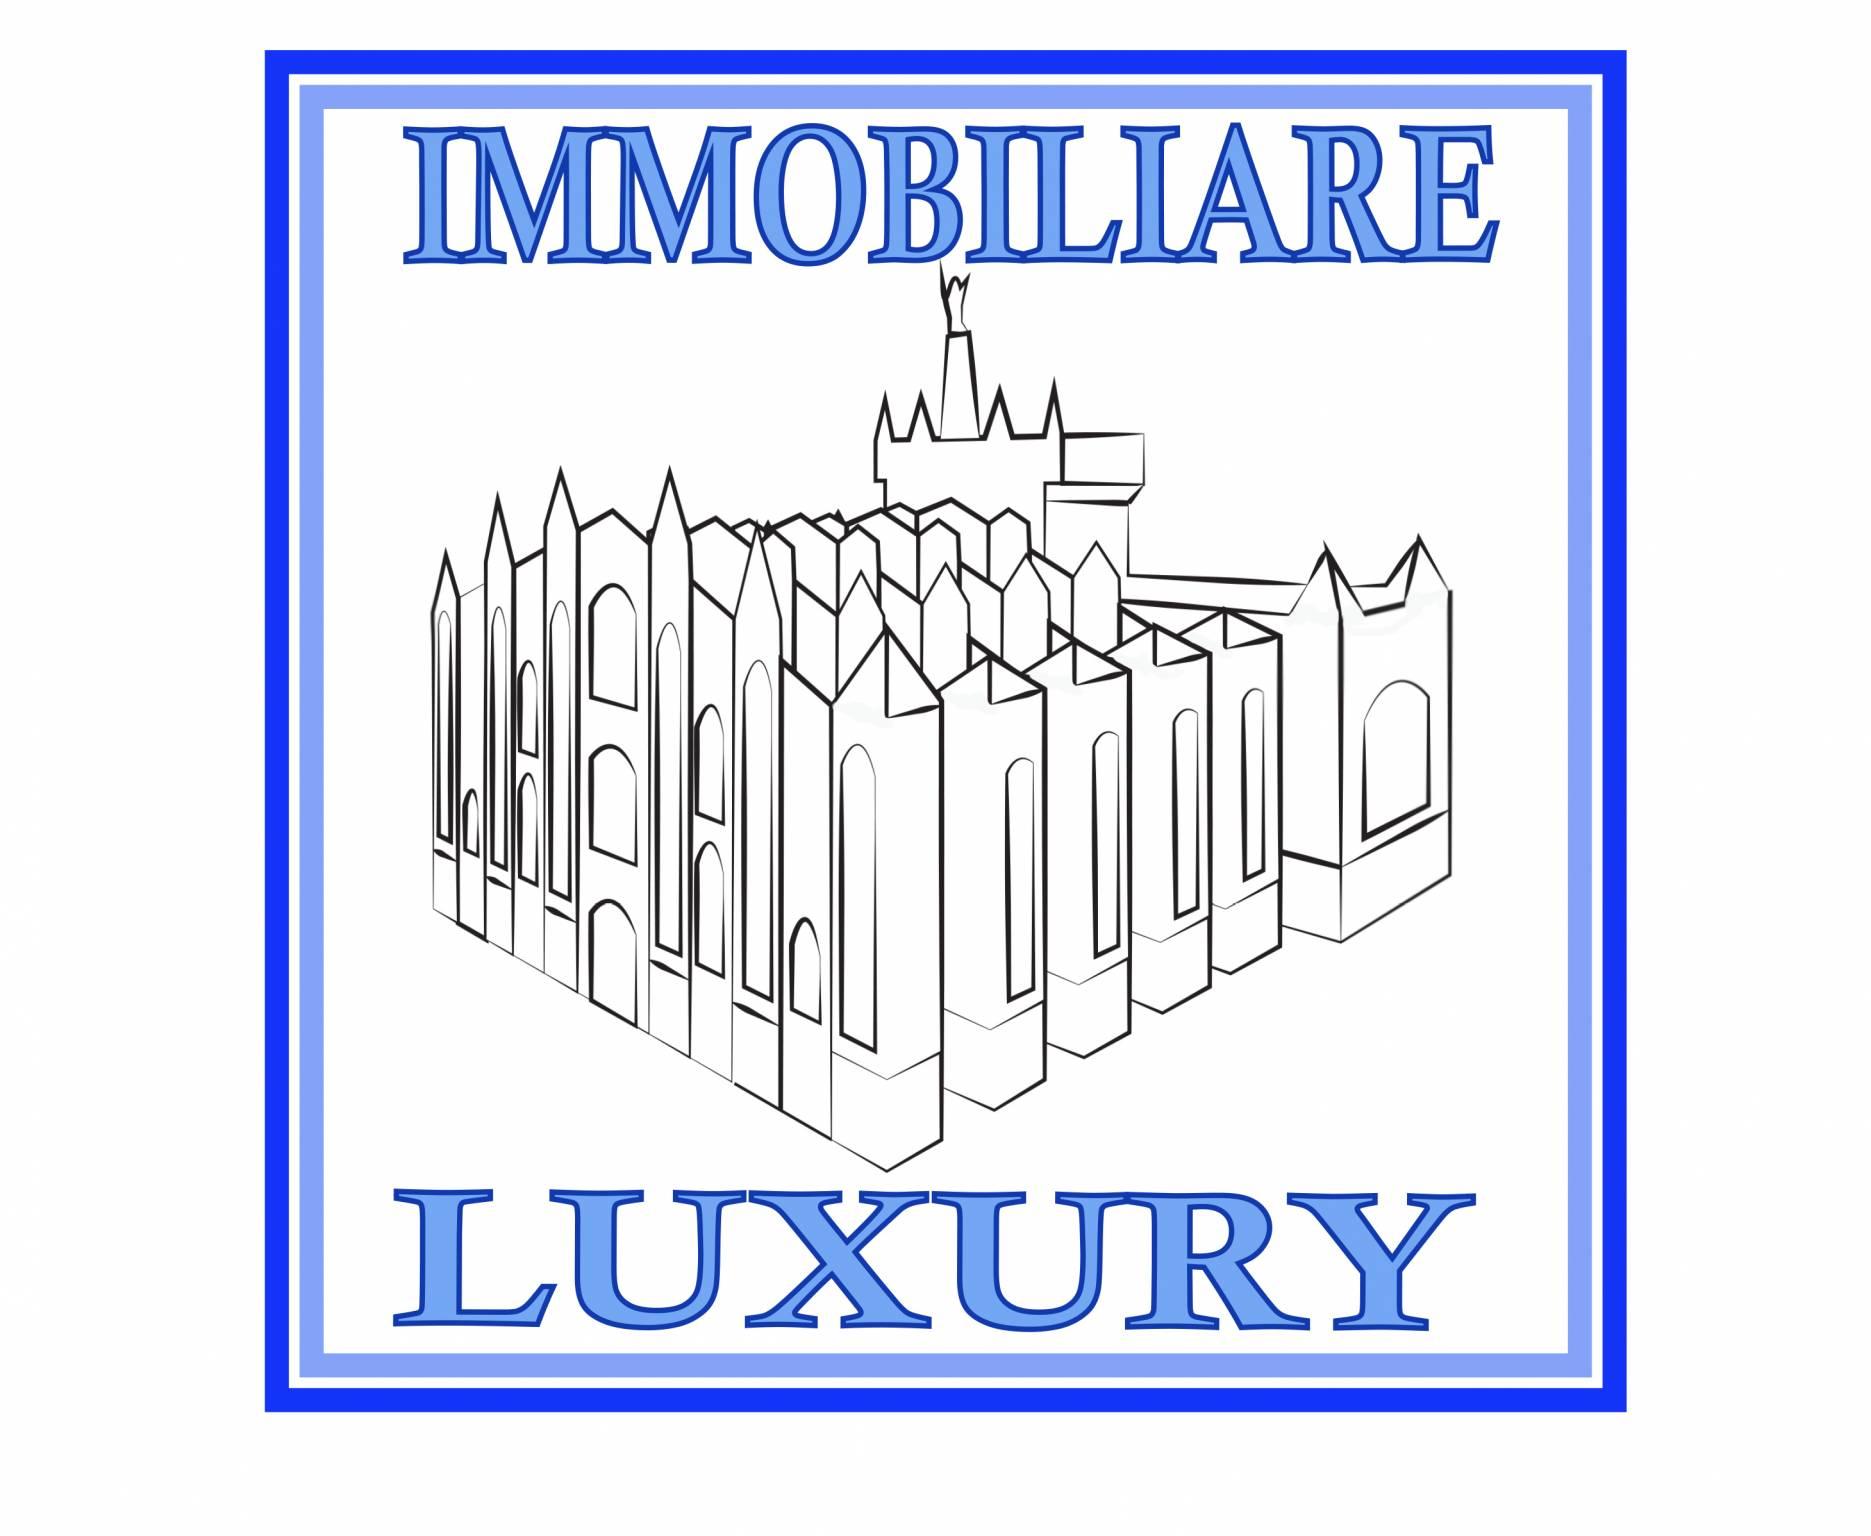 Immobiliare luxury